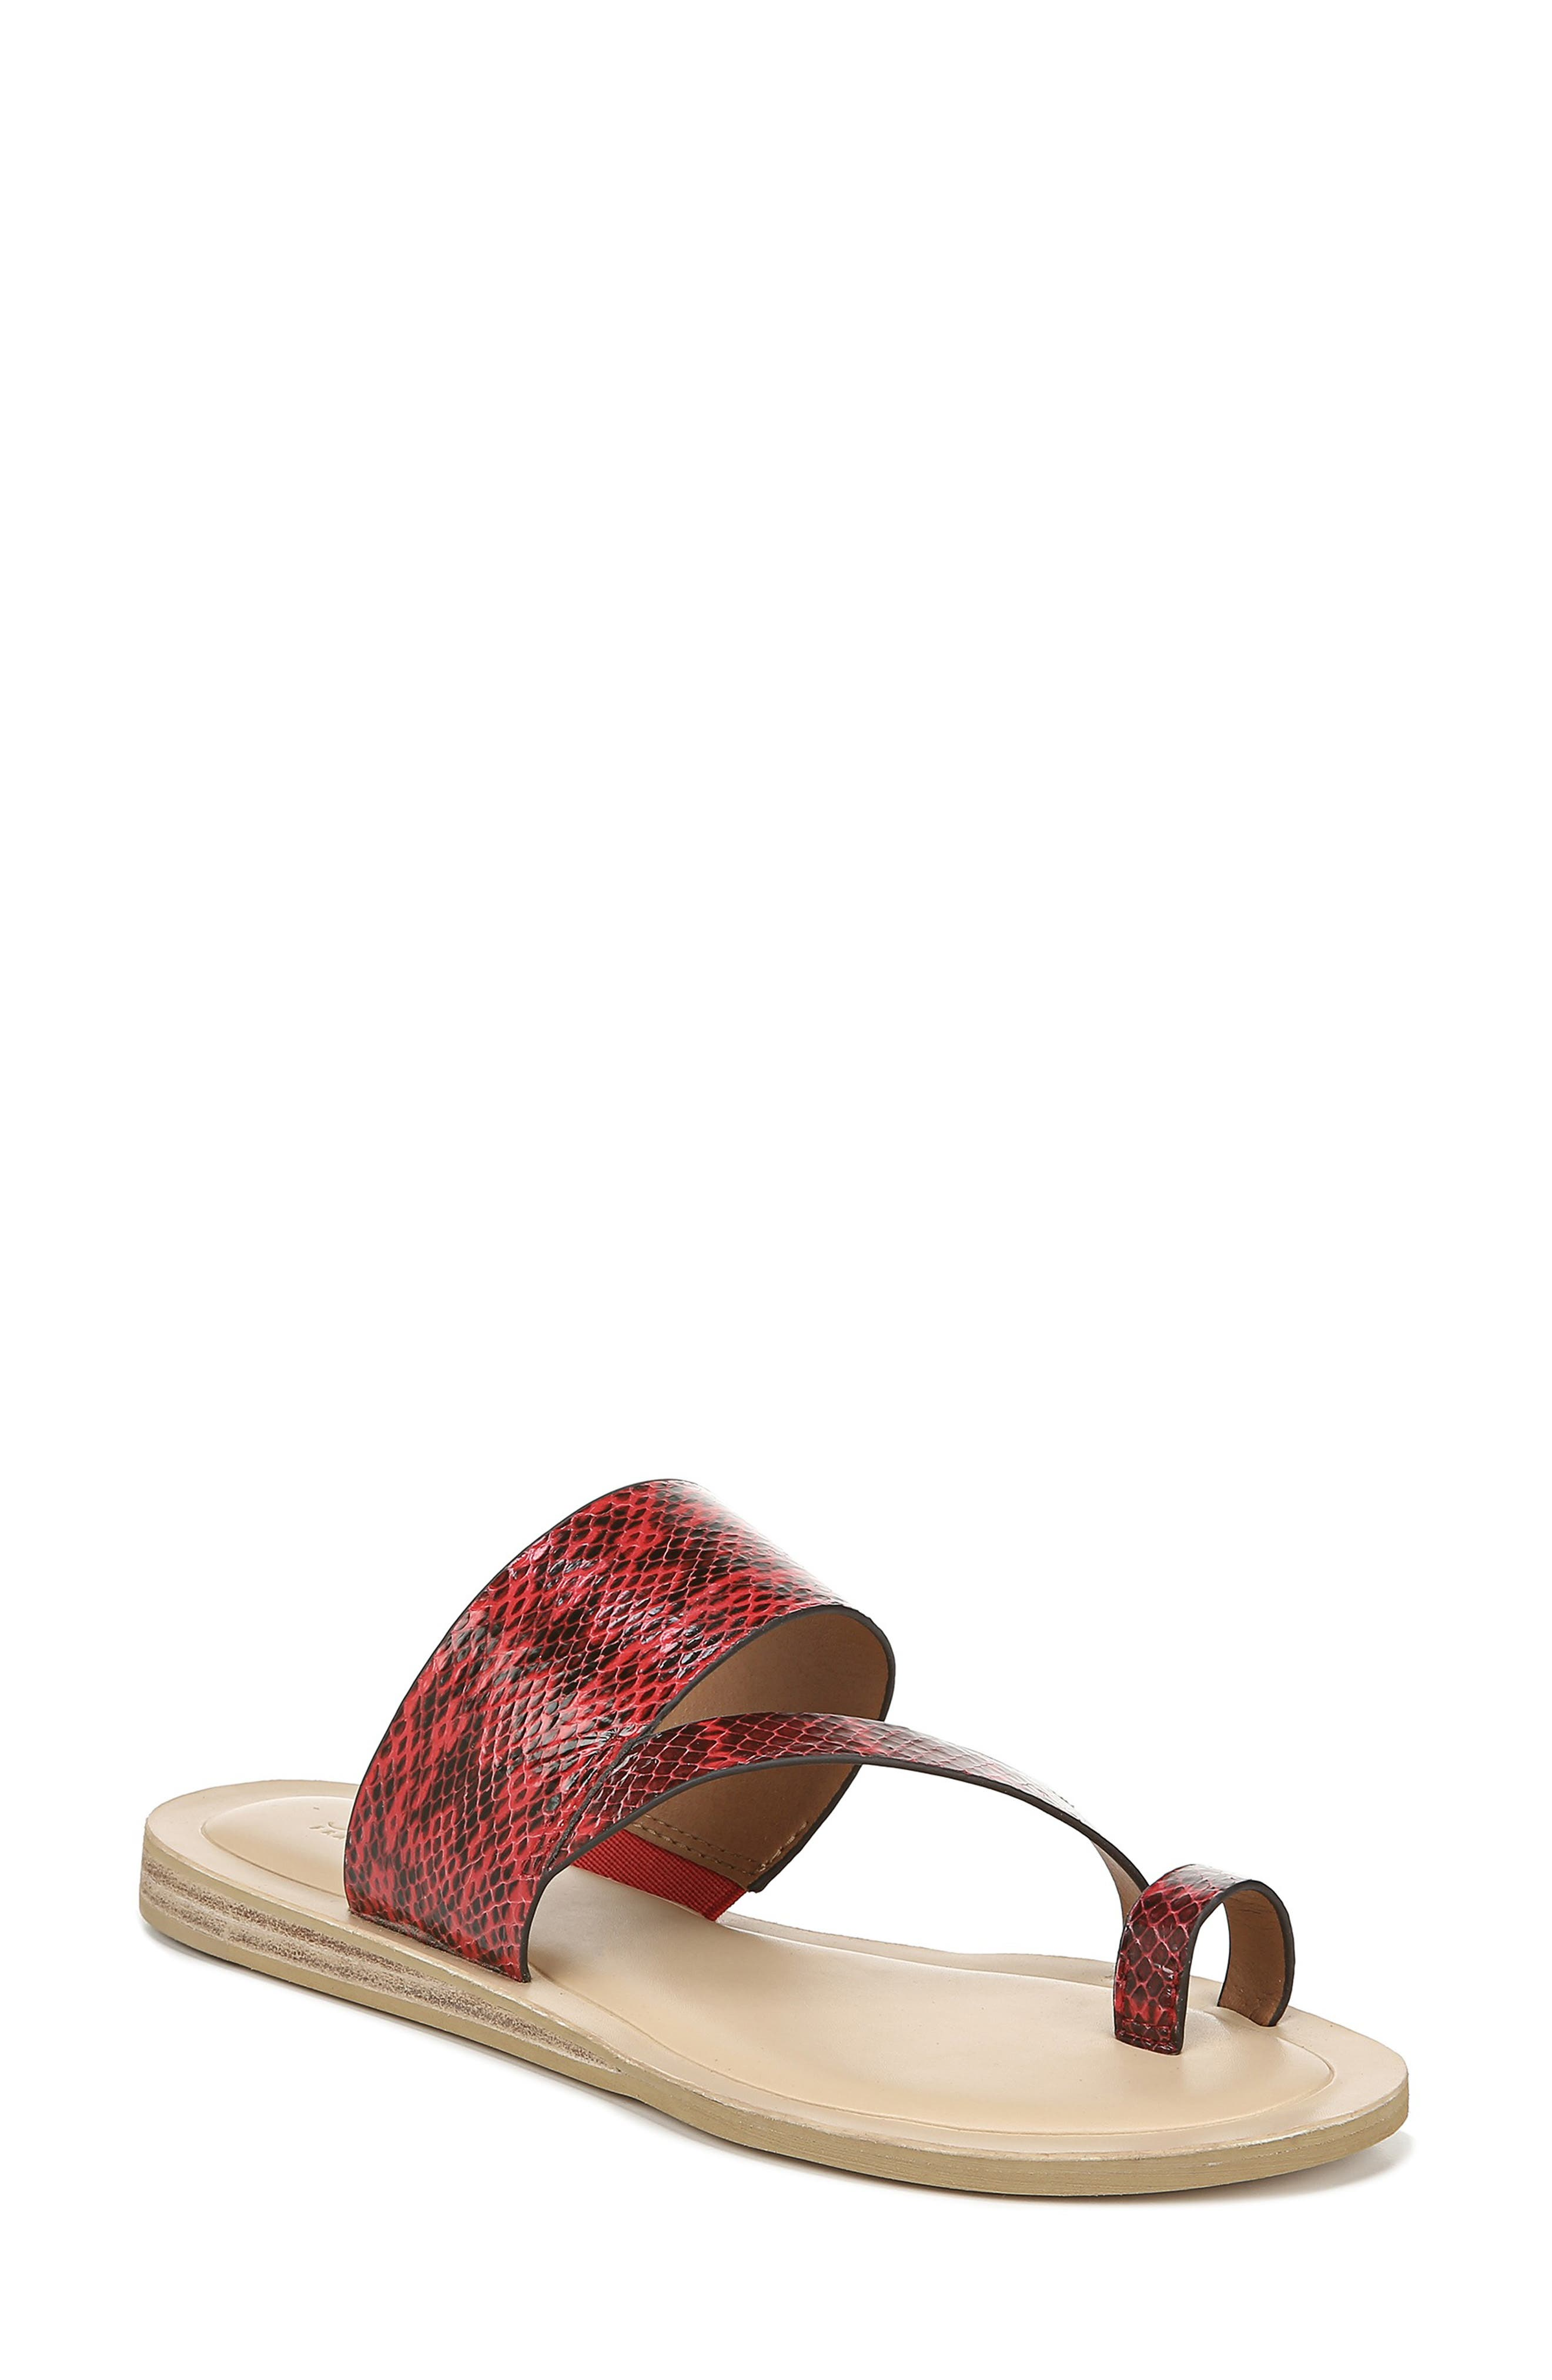 Sarto By Franco Sarto Leila Toe Loop Sandal- Red